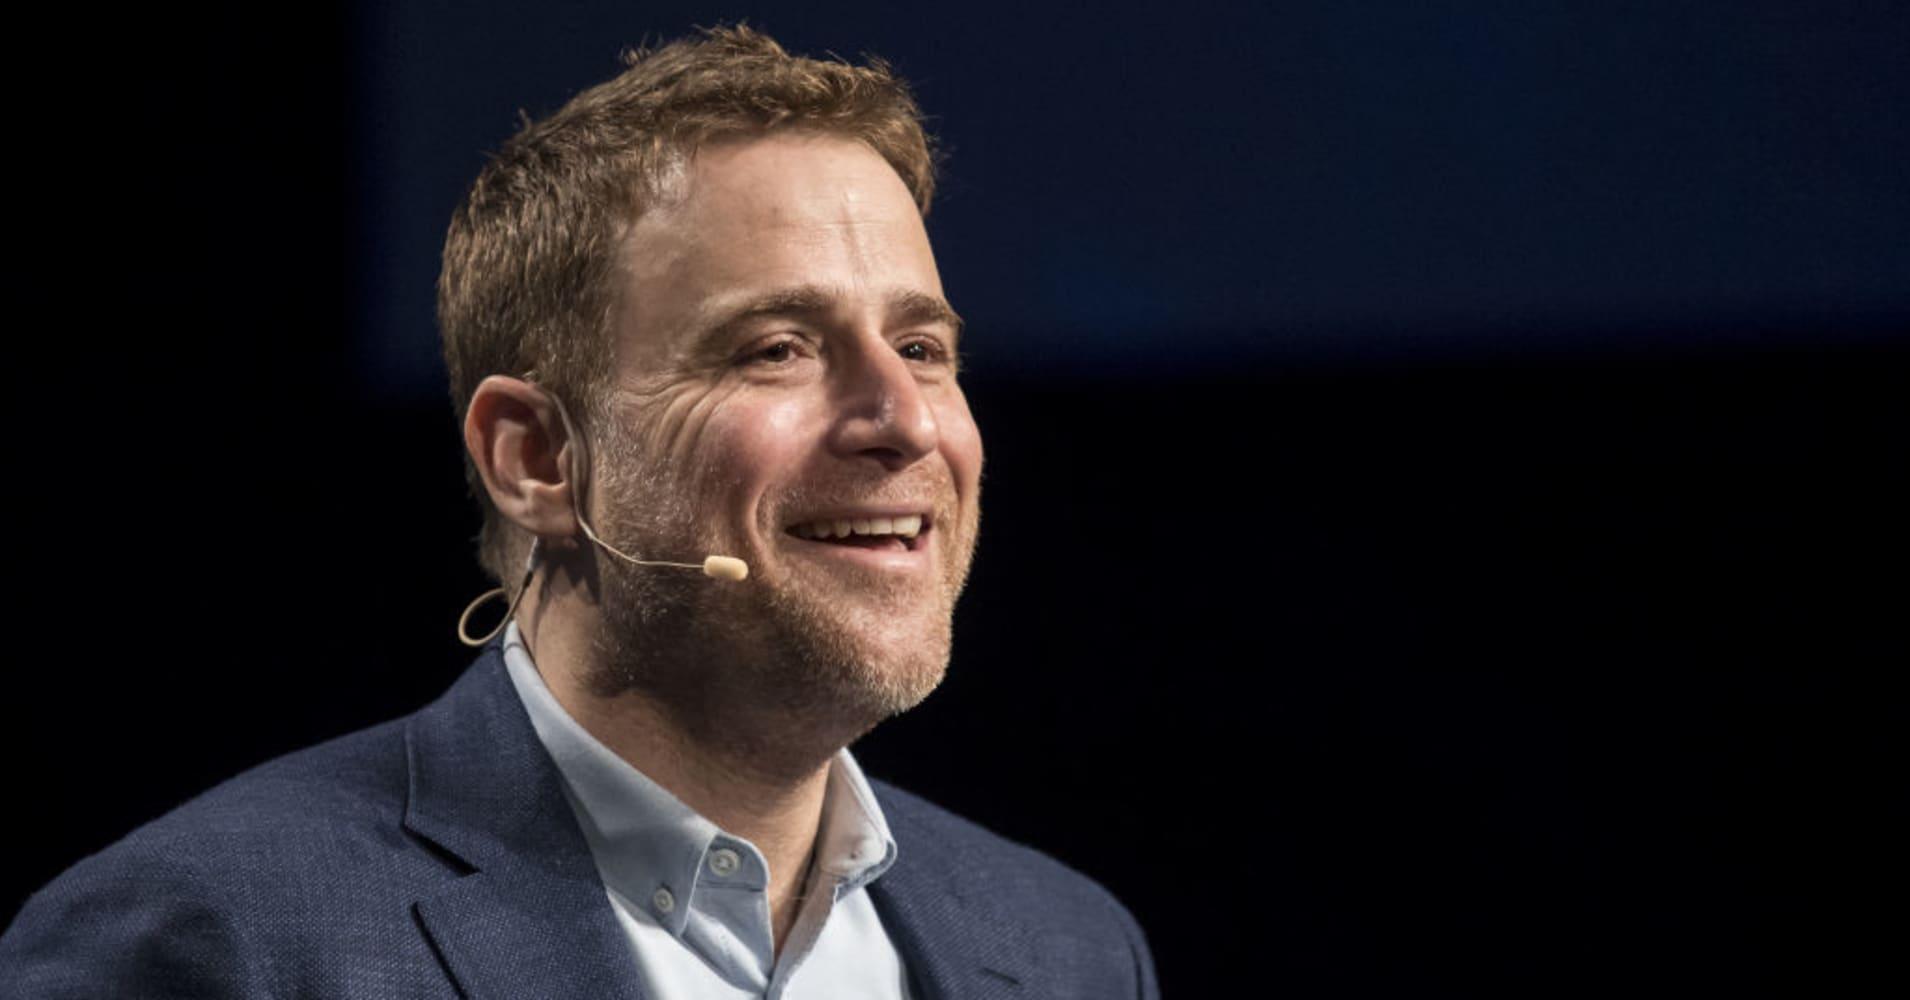 Top VC deals: Toyota backs Getaround, Slack tops $7 billion, Founders backs wall-crawling robots